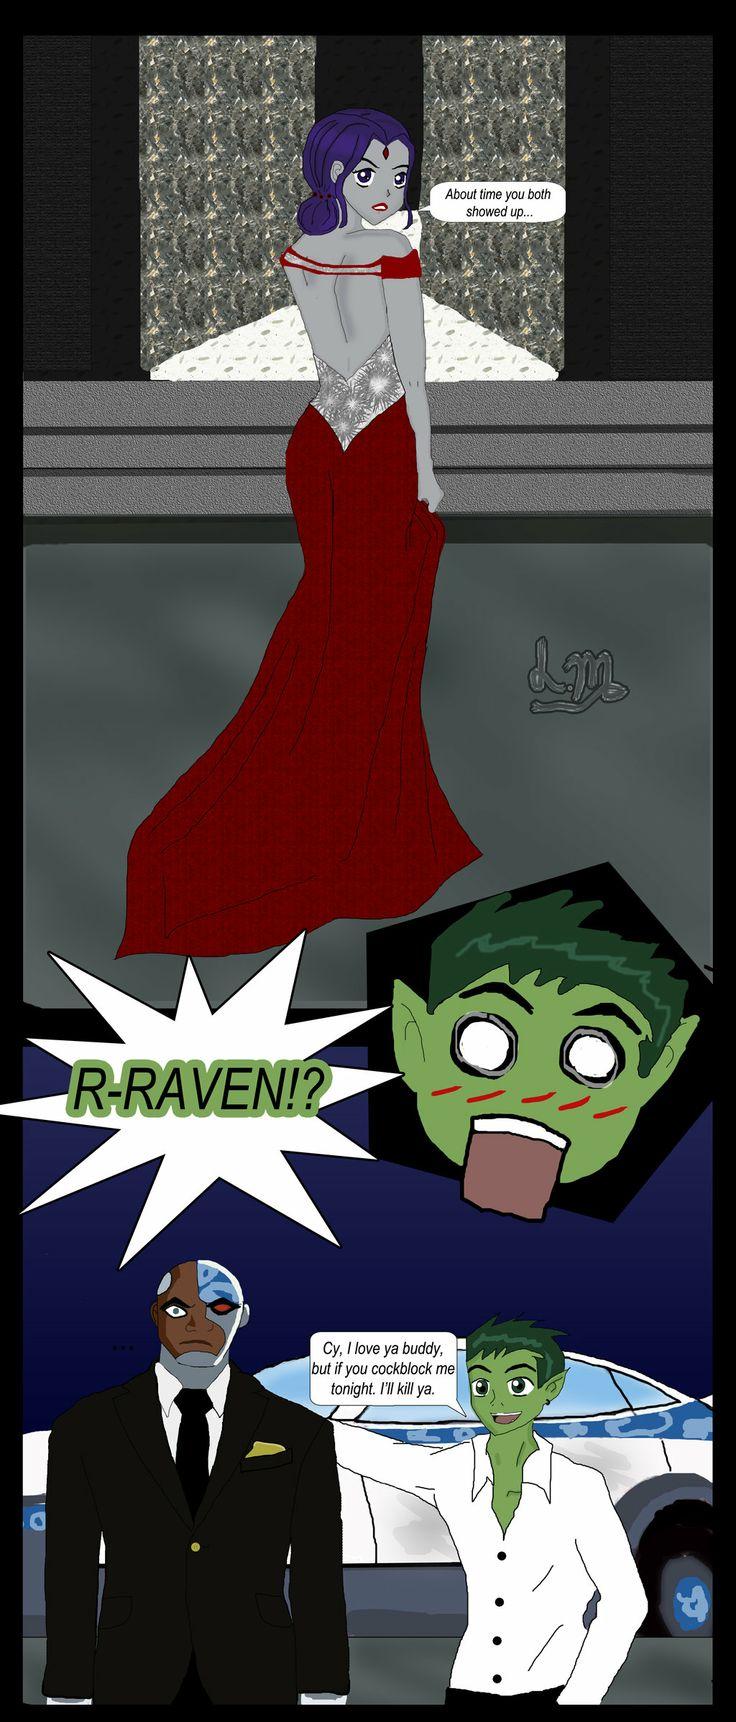 Beastboy+and+Raven+comic+by+lesliemint.deviantart.com+on+@deviantART